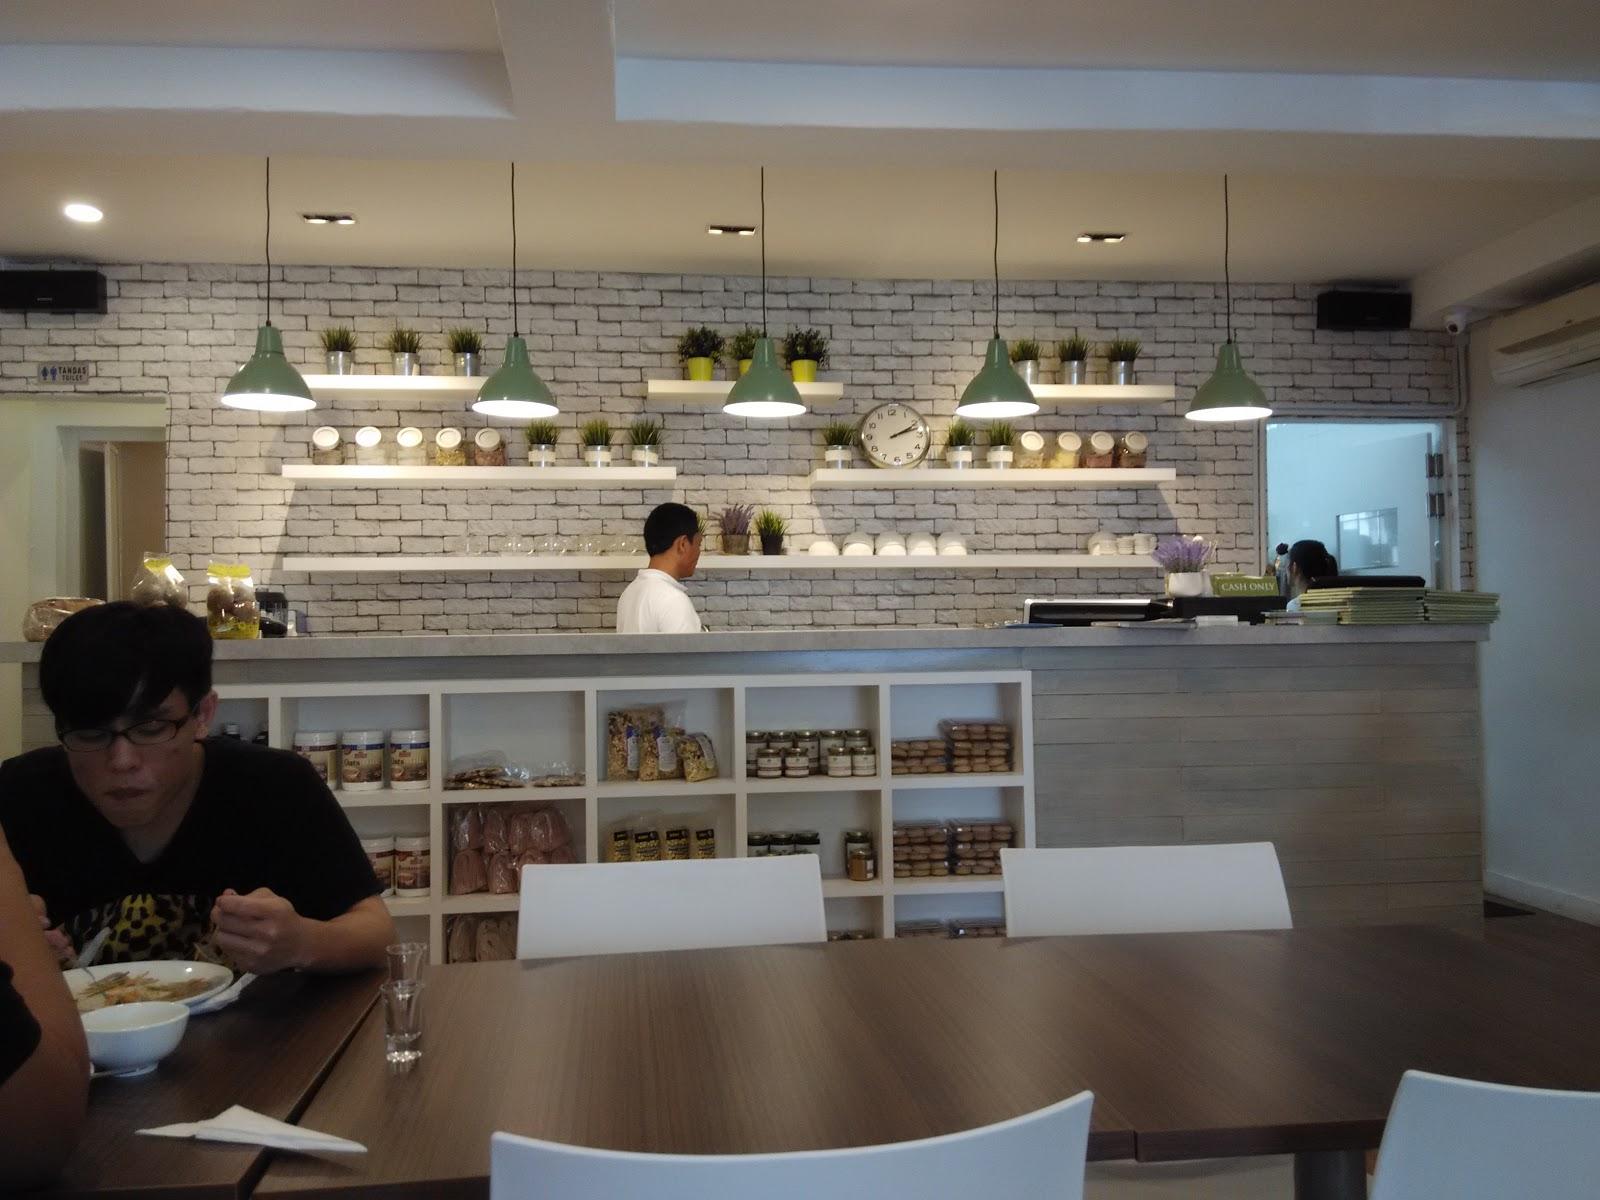 Jes One Stop: Aenon - The Health Kitchen in Miharja Cheras